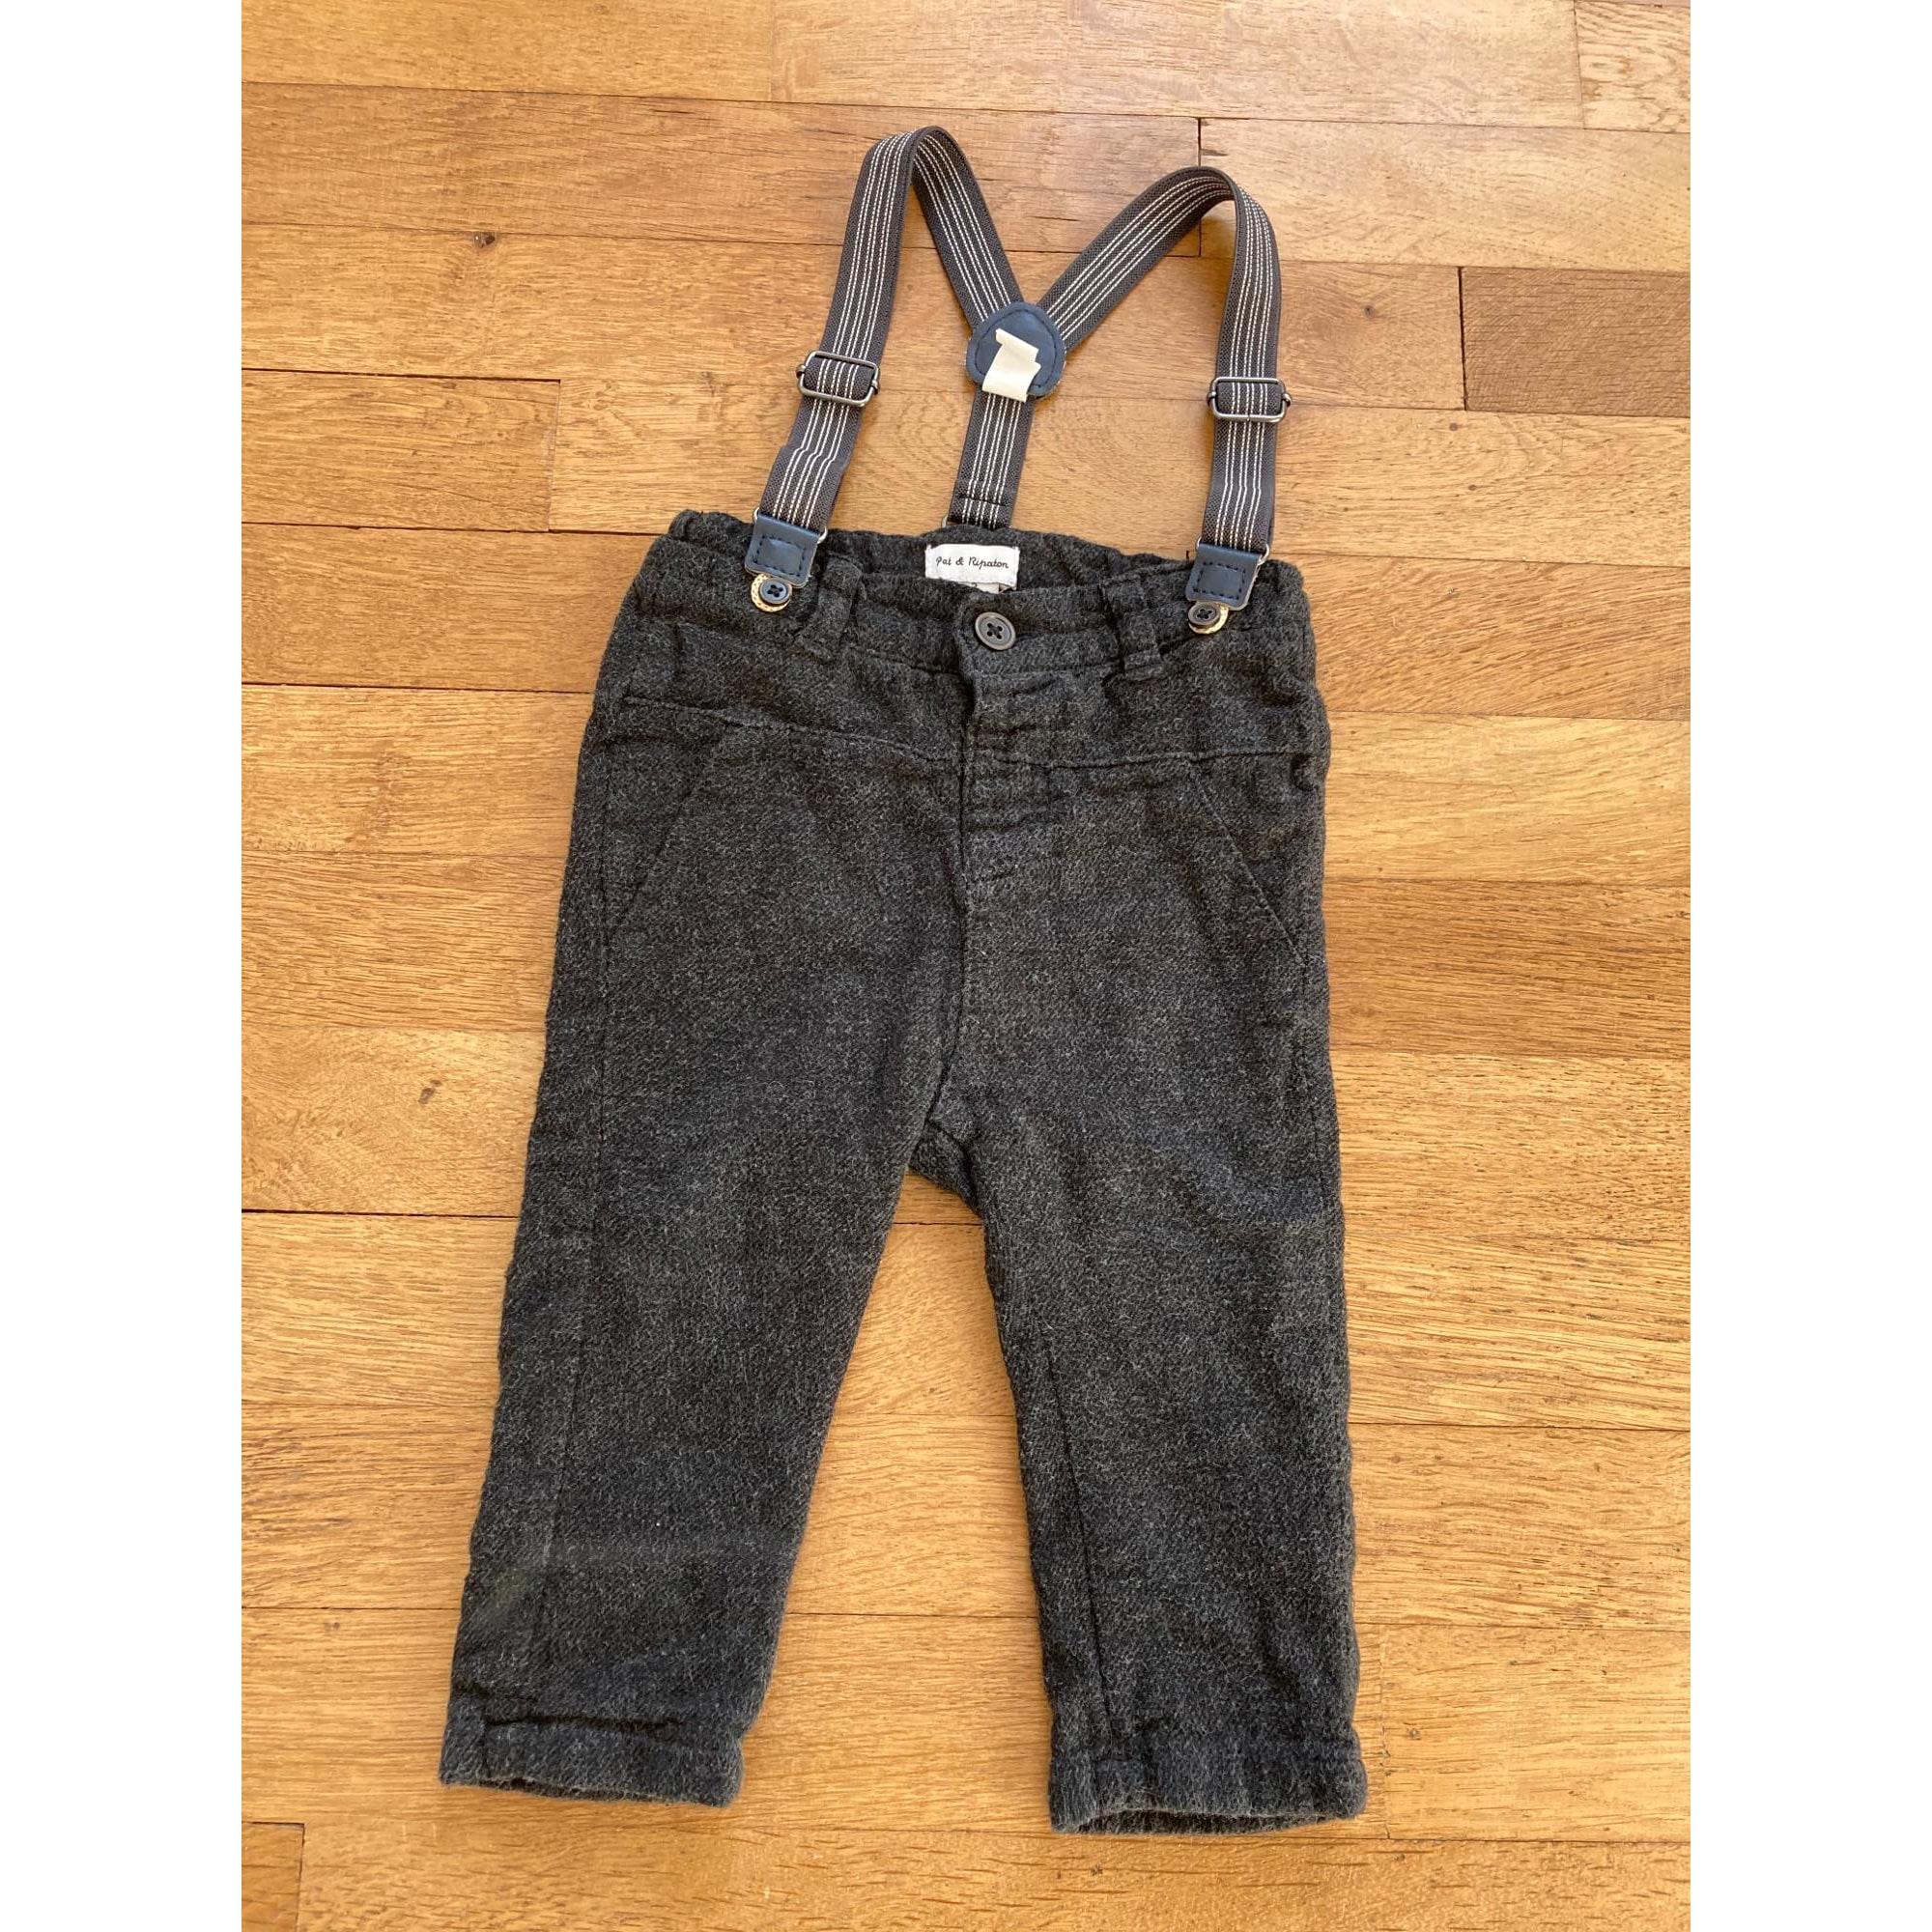 Pantalon PAT ET RIPATON Gris, anthracite